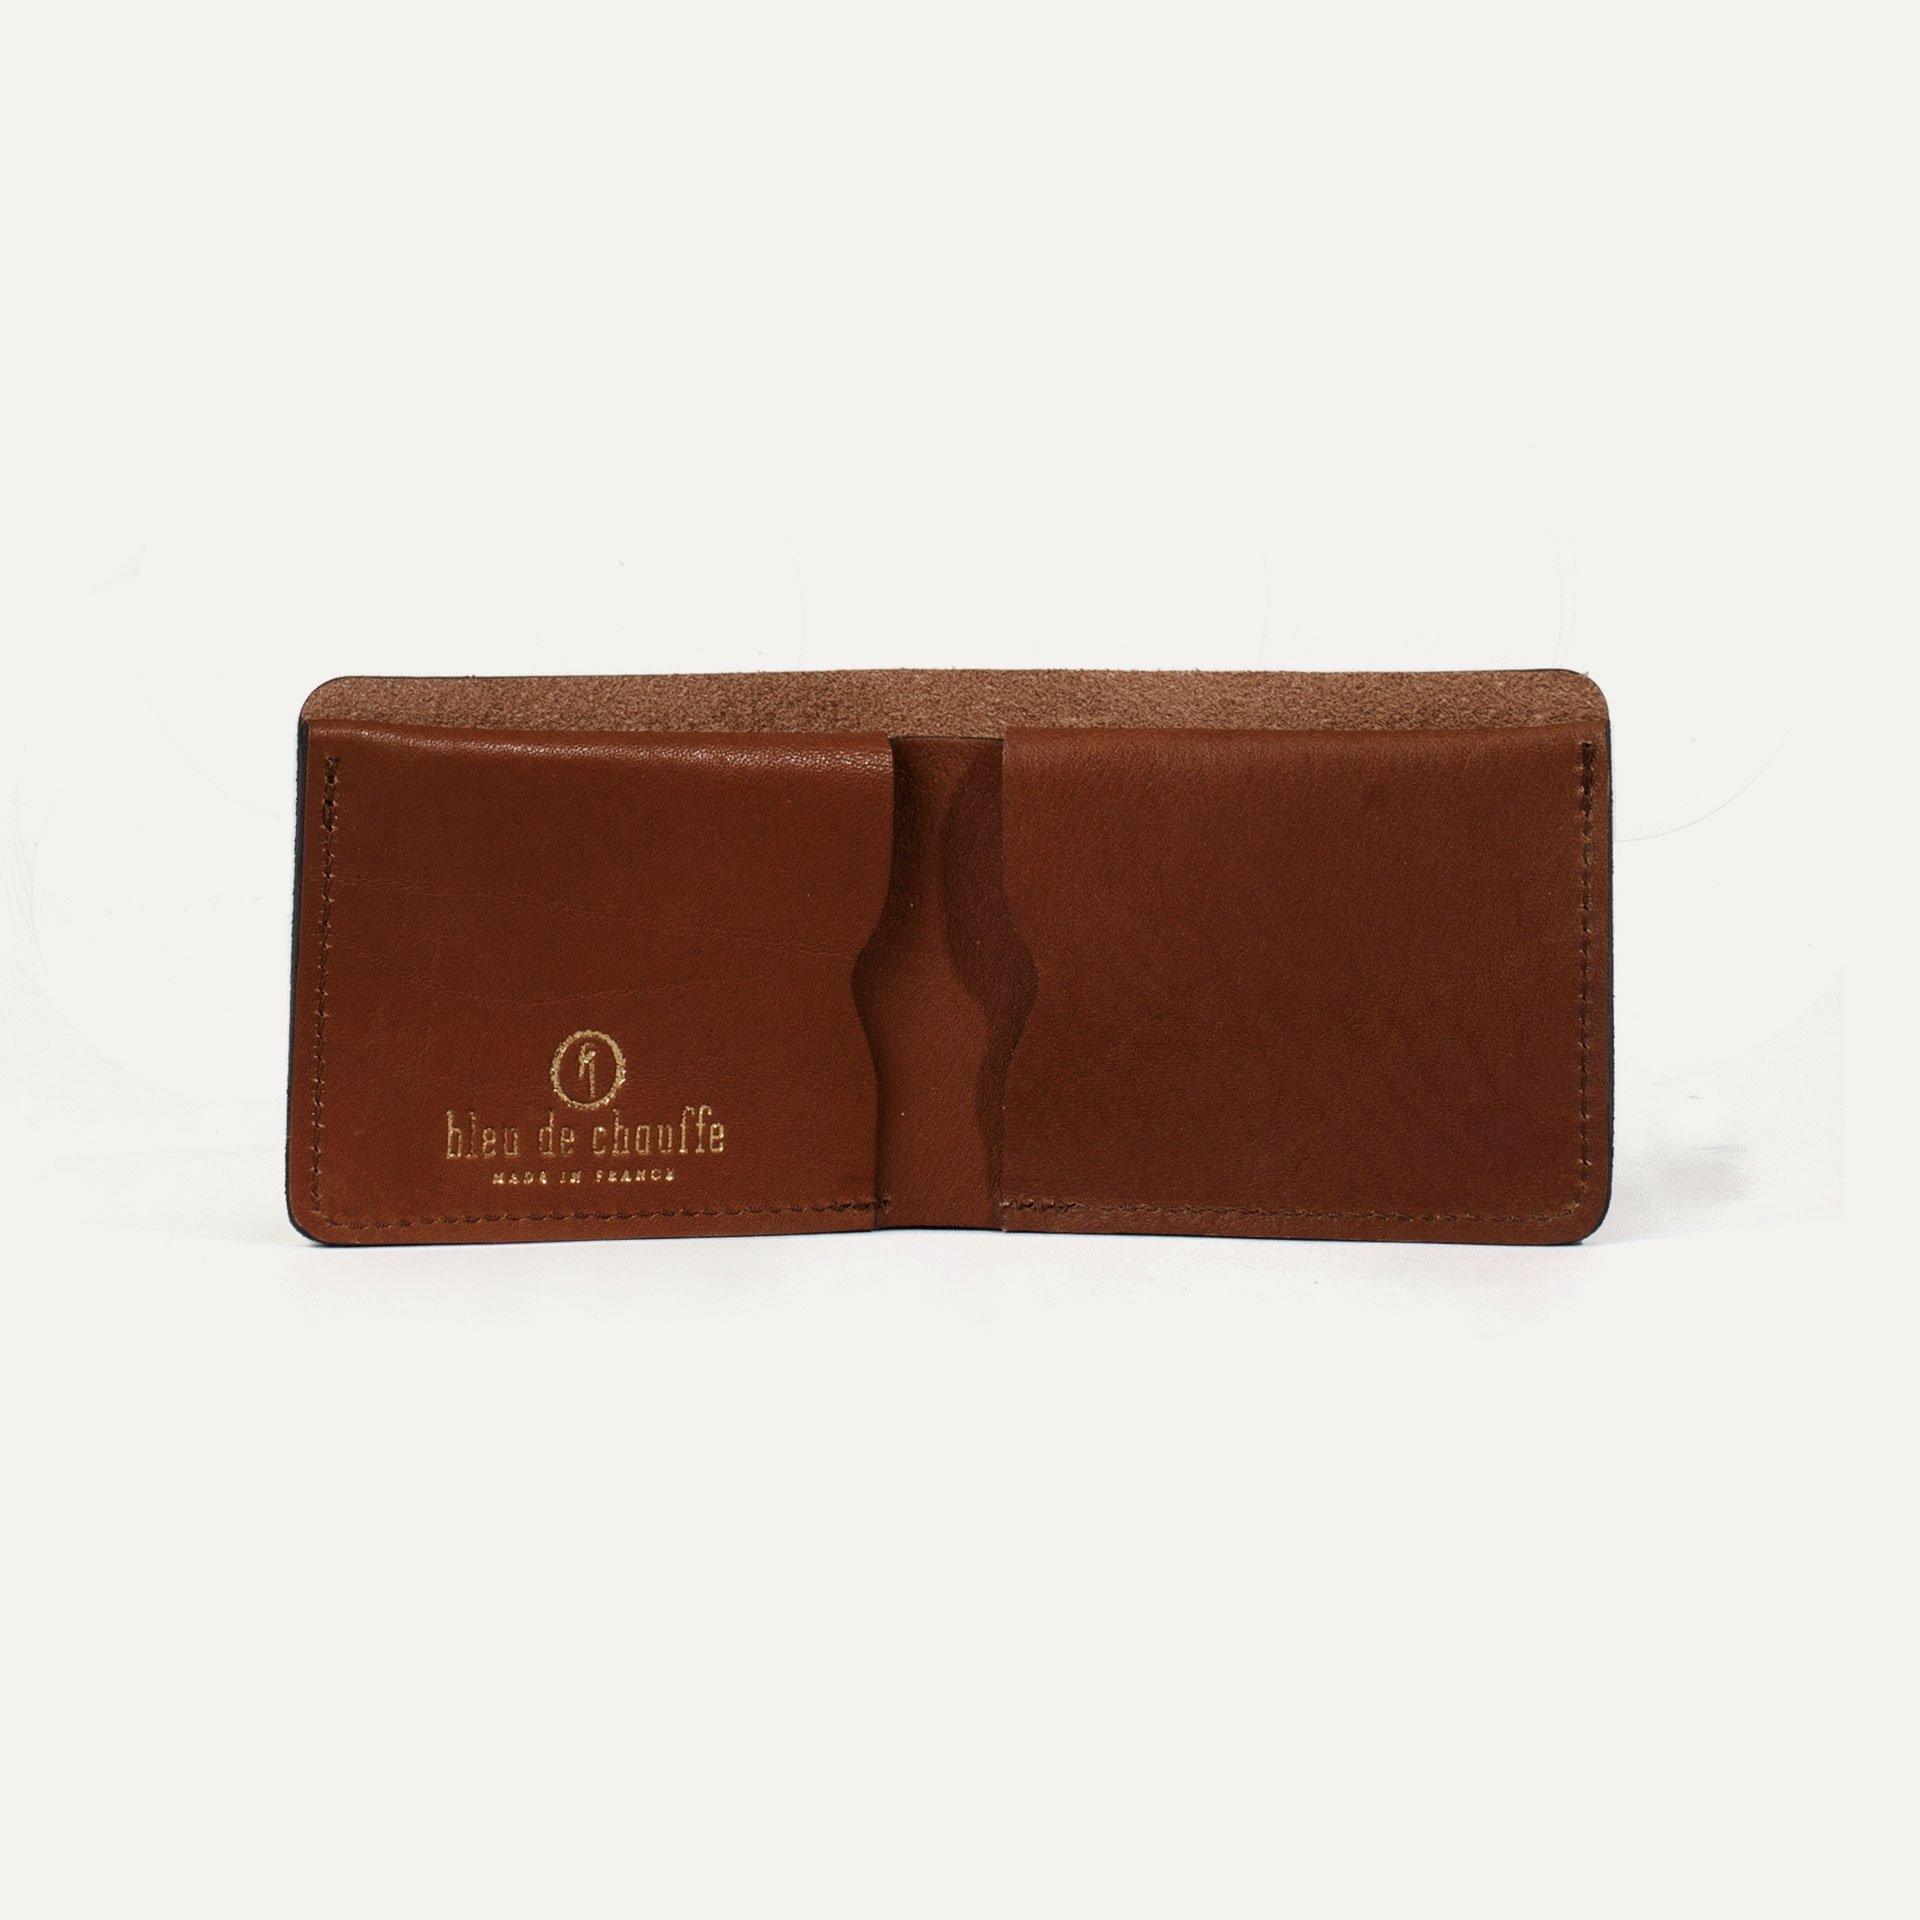 PEZE wallet - Cuba Libre (image n°2)